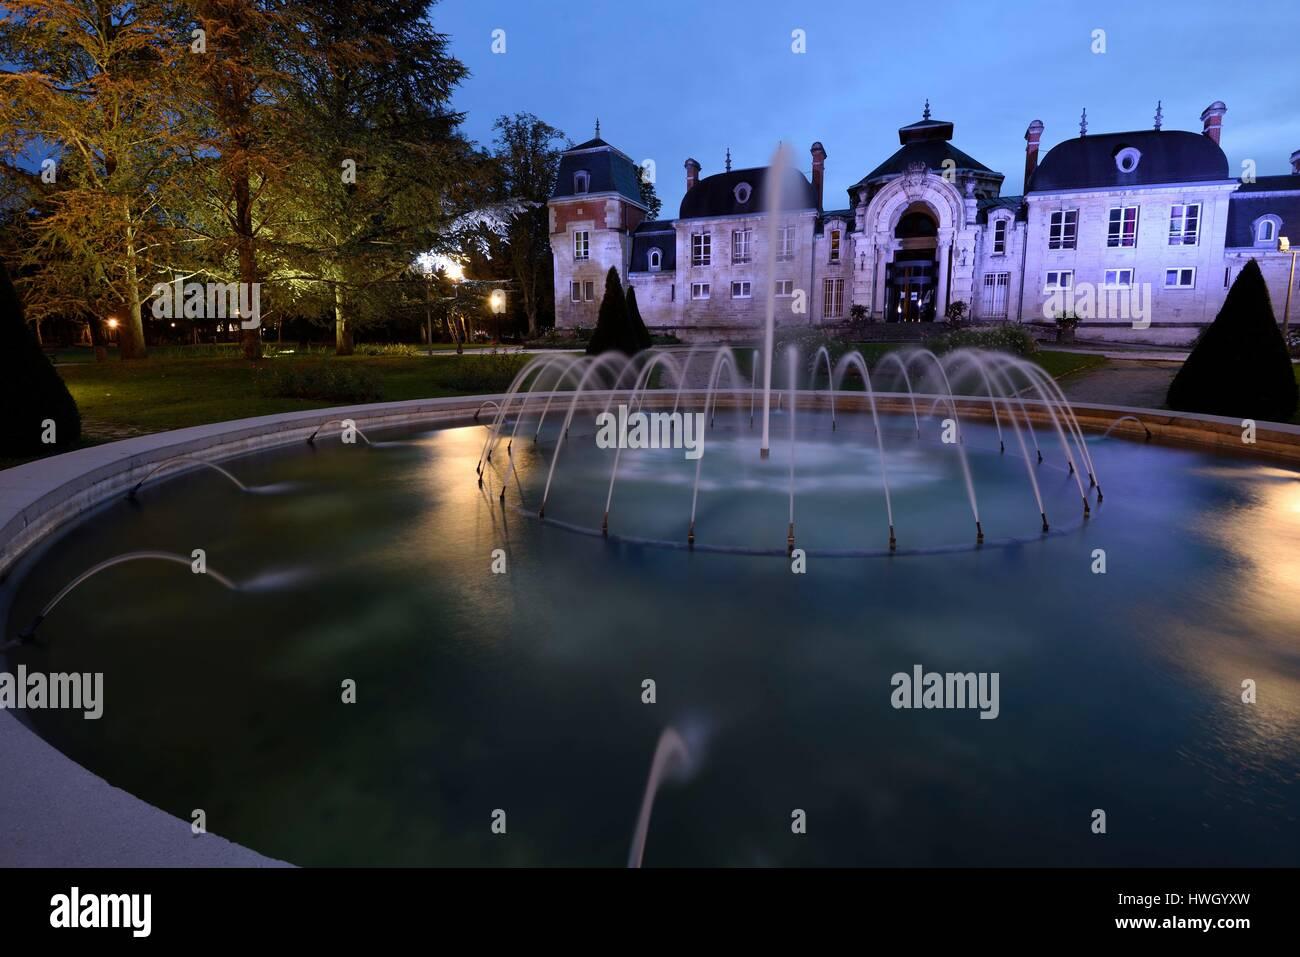 France, Jura, Lons le Saunier, Edward Guenon spa gardens, spas Ledonia dated 19th century, pond, water jet Stock Photo